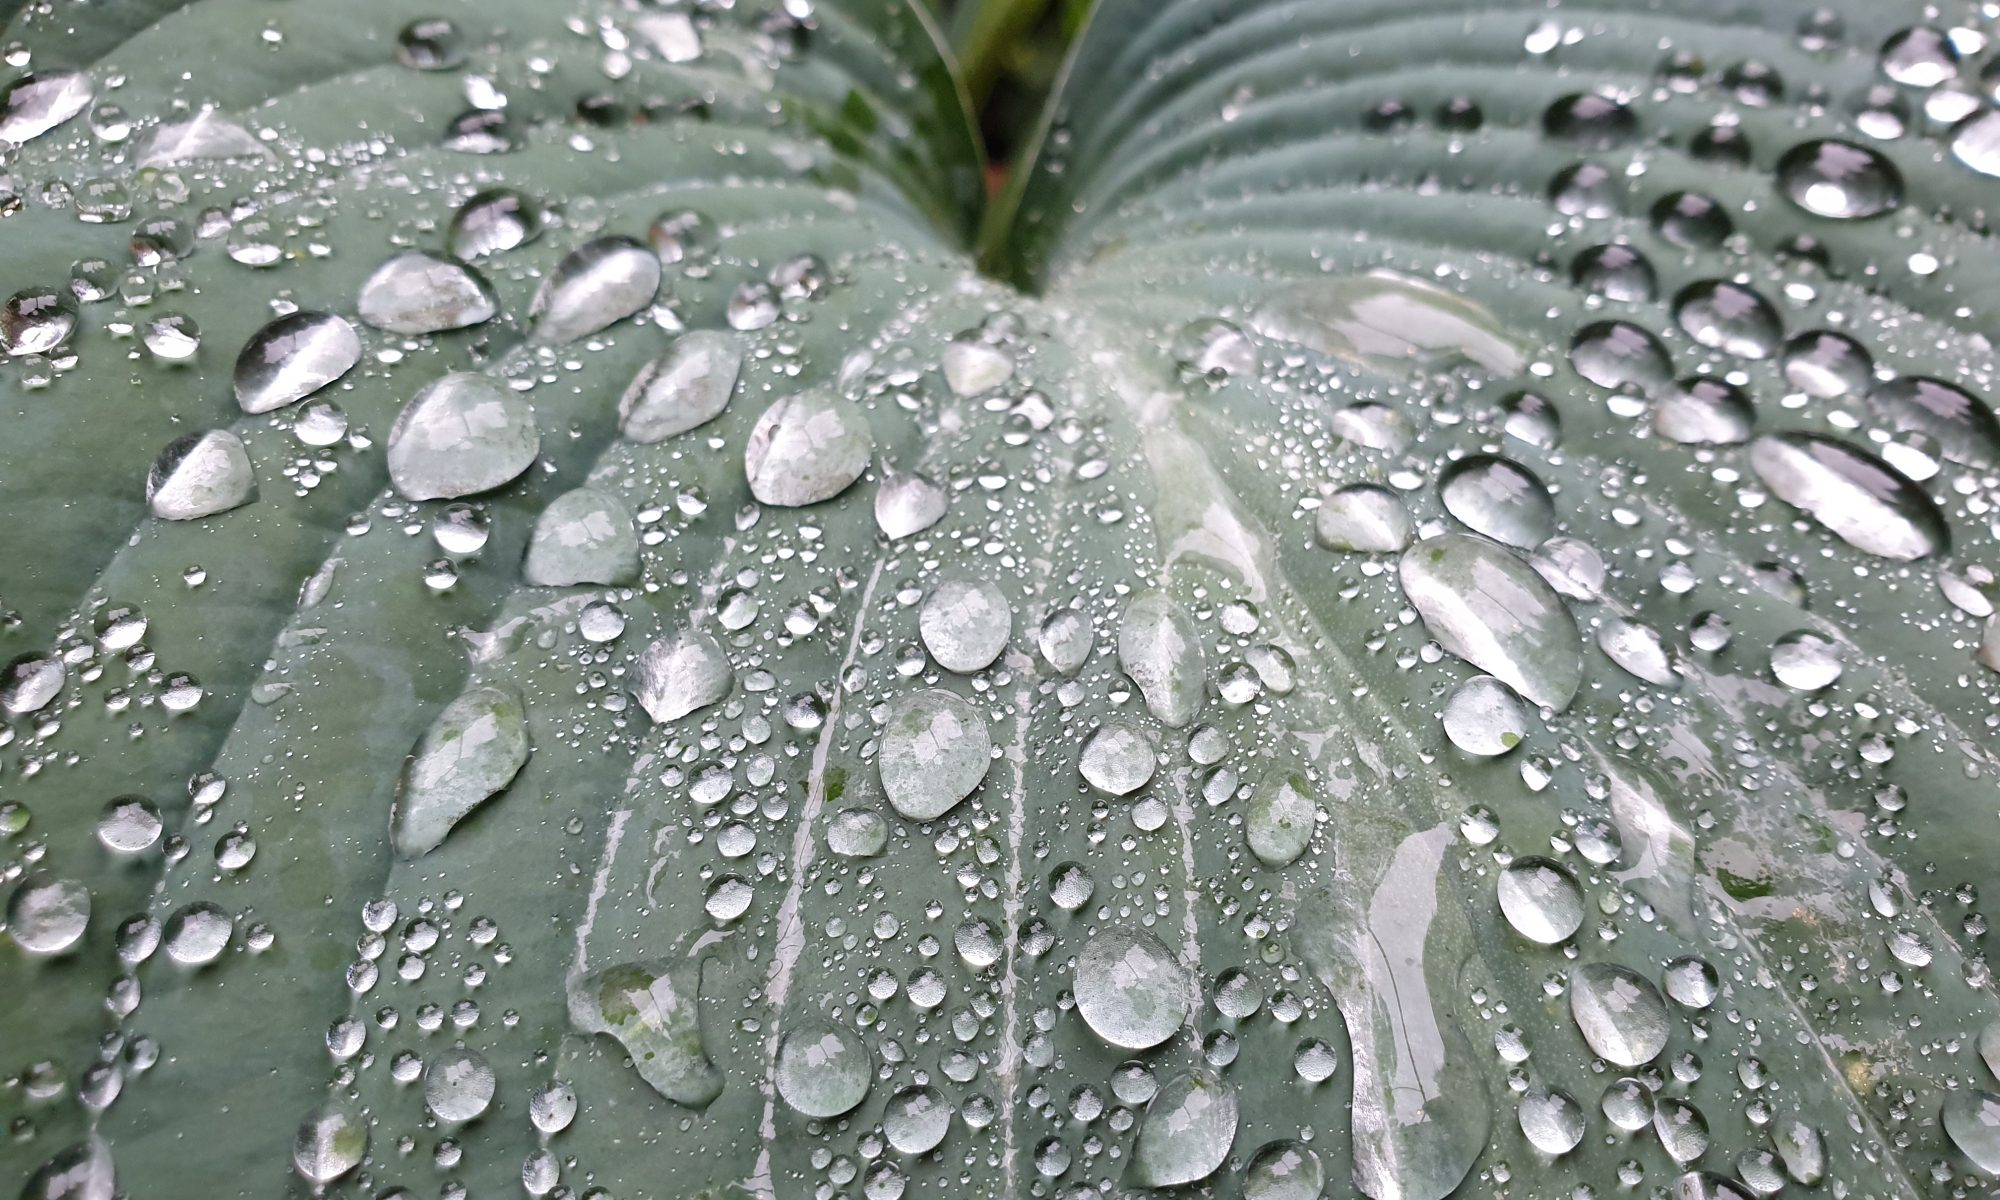 Big Hosta leaf with raindrops